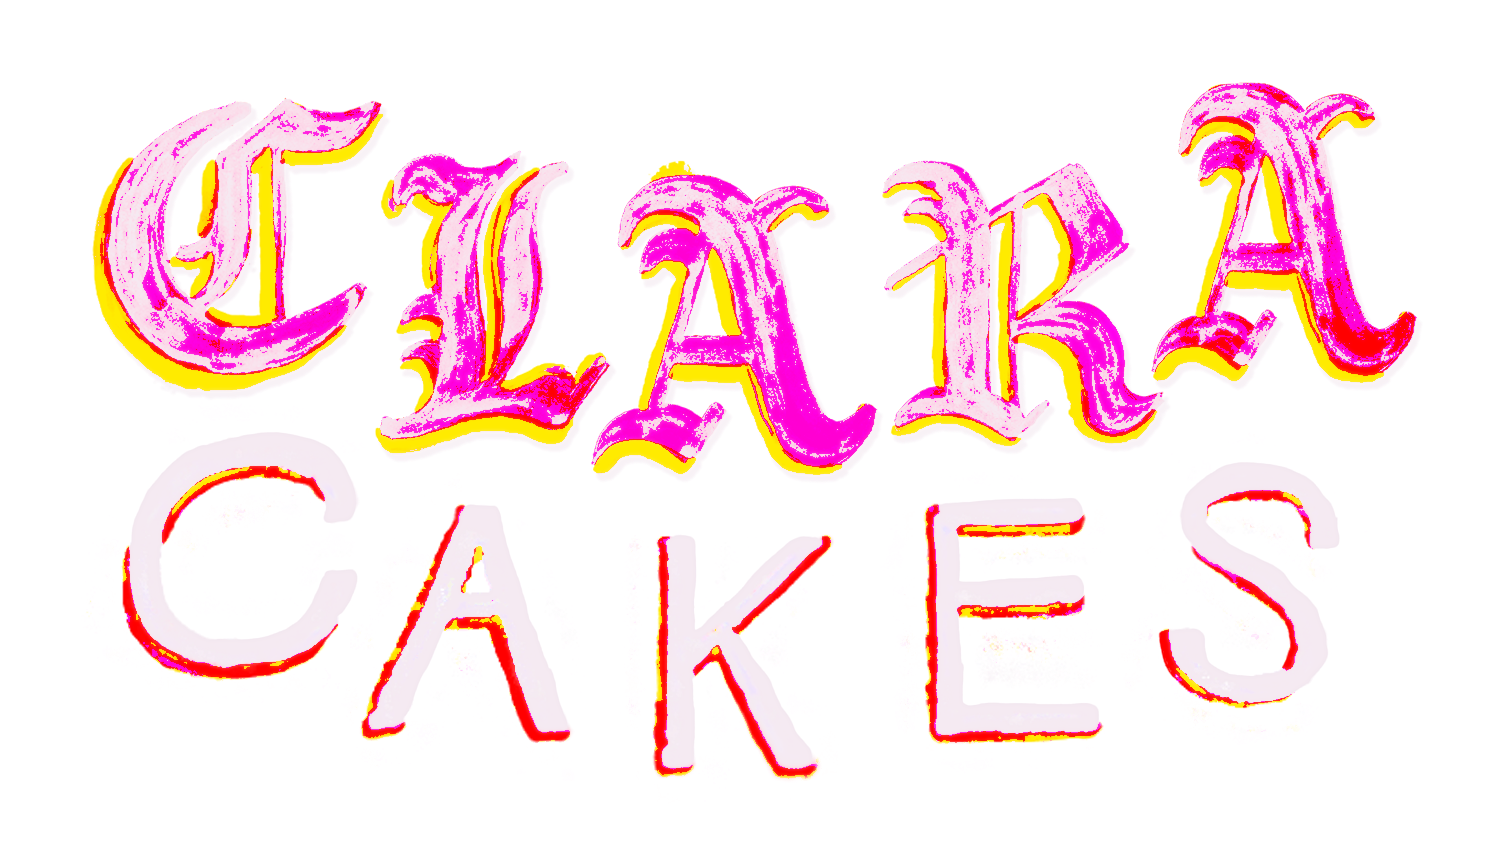 Clara Cakesclara Cakes